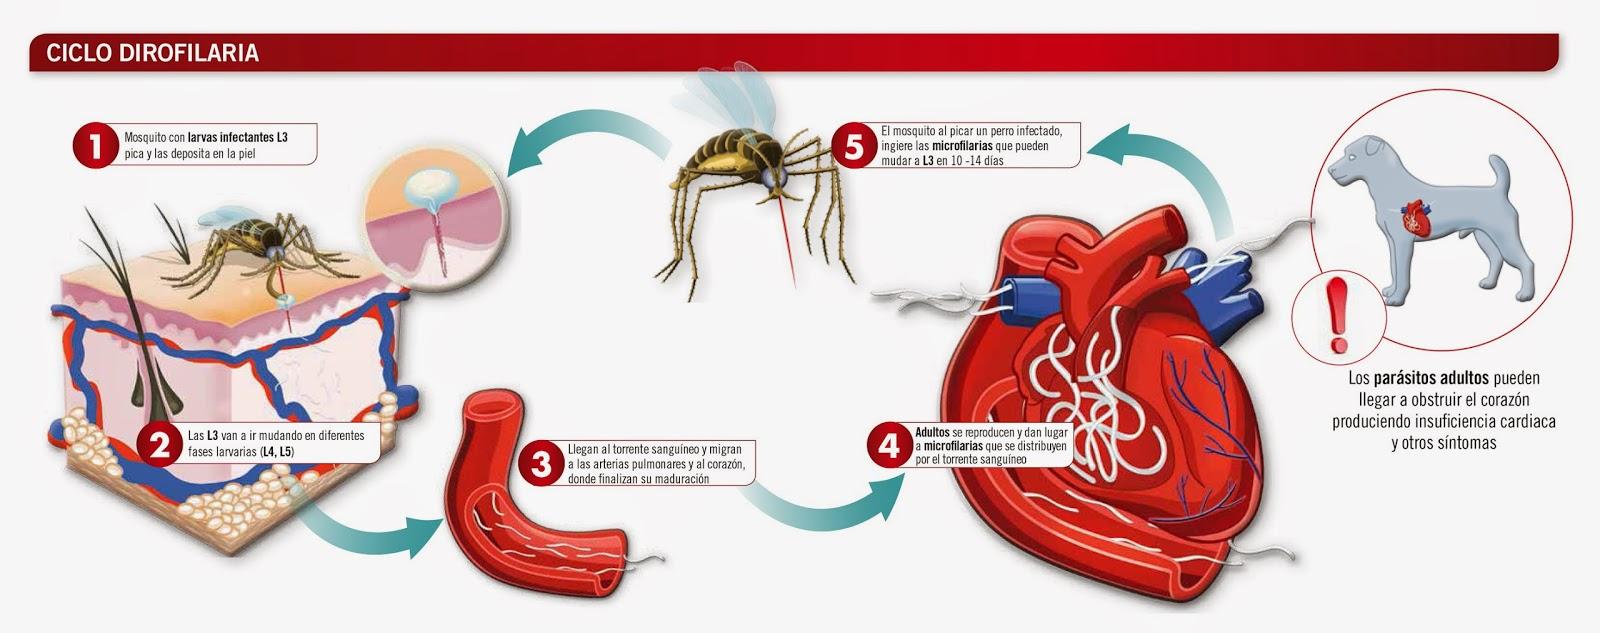 Circuito Sanguineo : Veterinarios ronda: mayo 2014